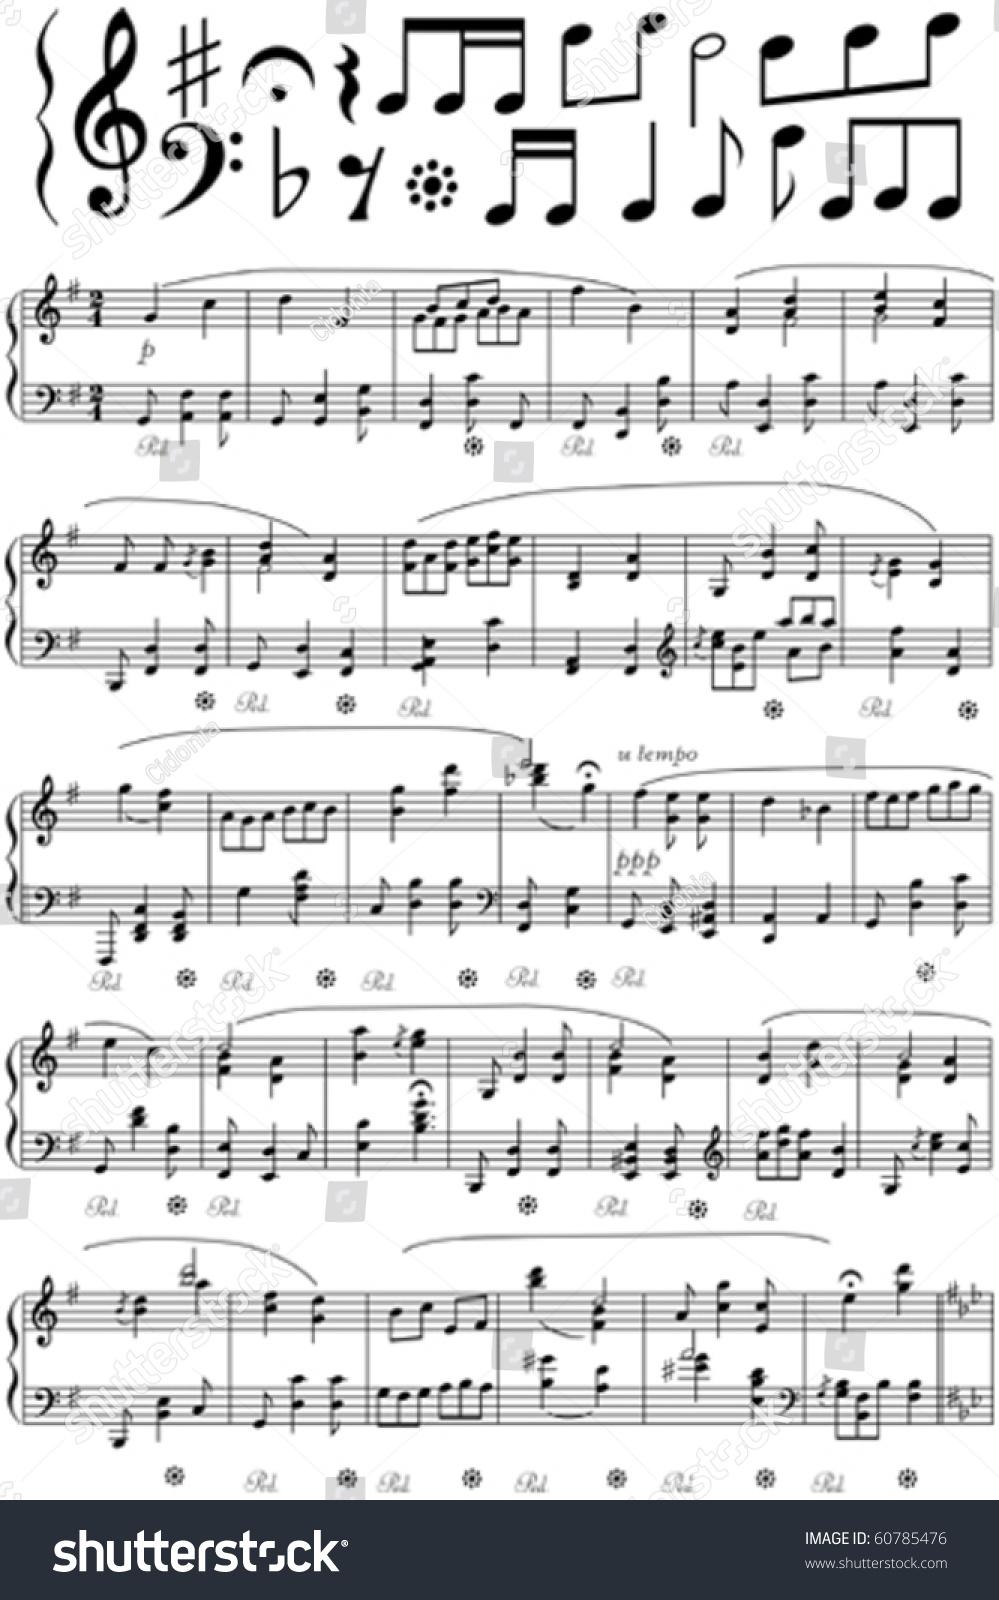 musictext music text pendulum - photo #37